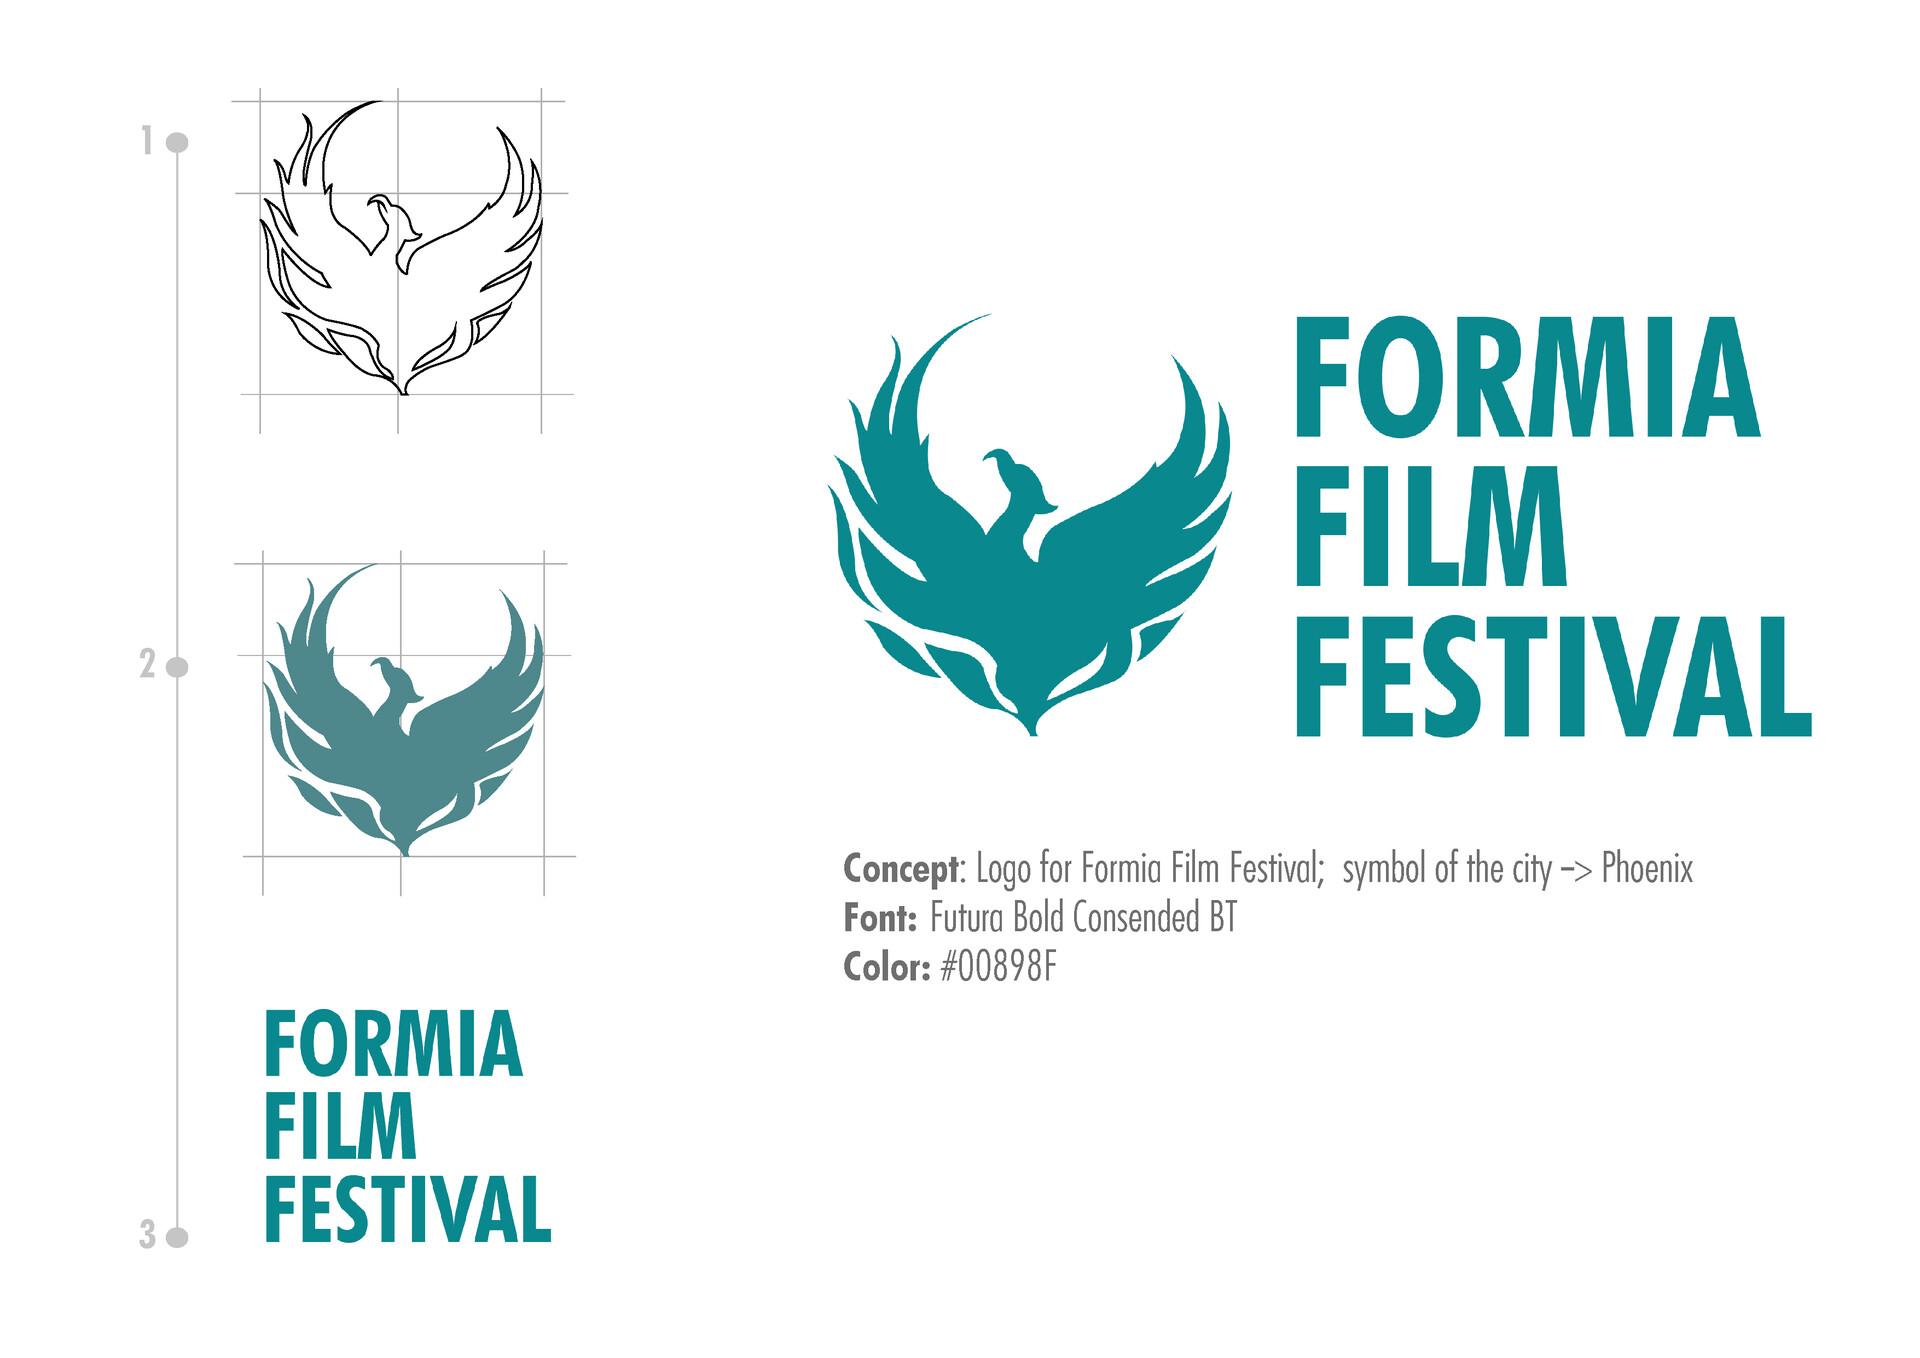 ArtStation - Formia Film Festival, Ilaria Romano